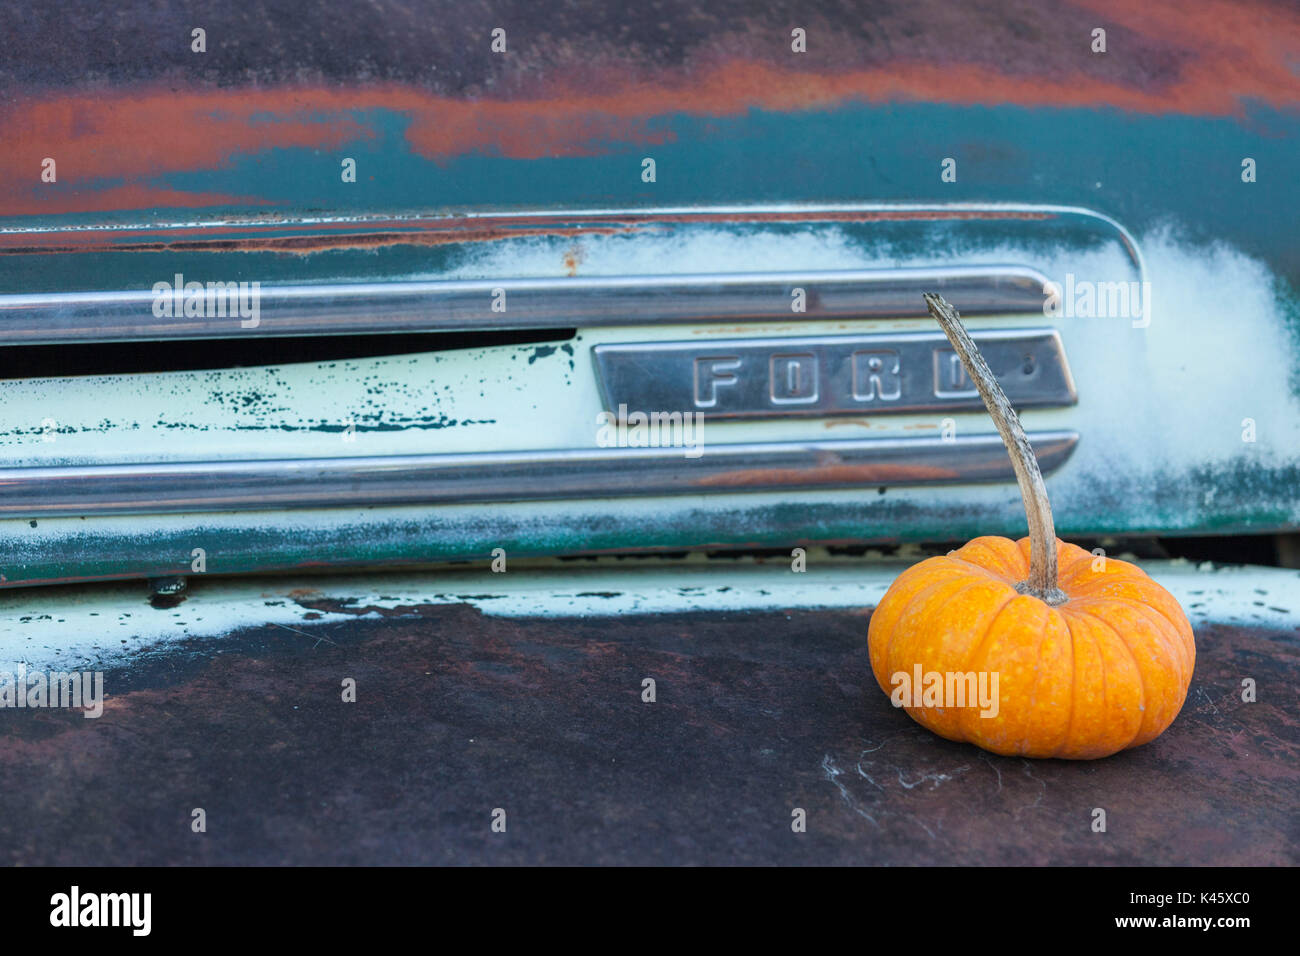 USA, New York, Adirondack Mountains, Bolton Landing, autumn pumpkins - Stock Image